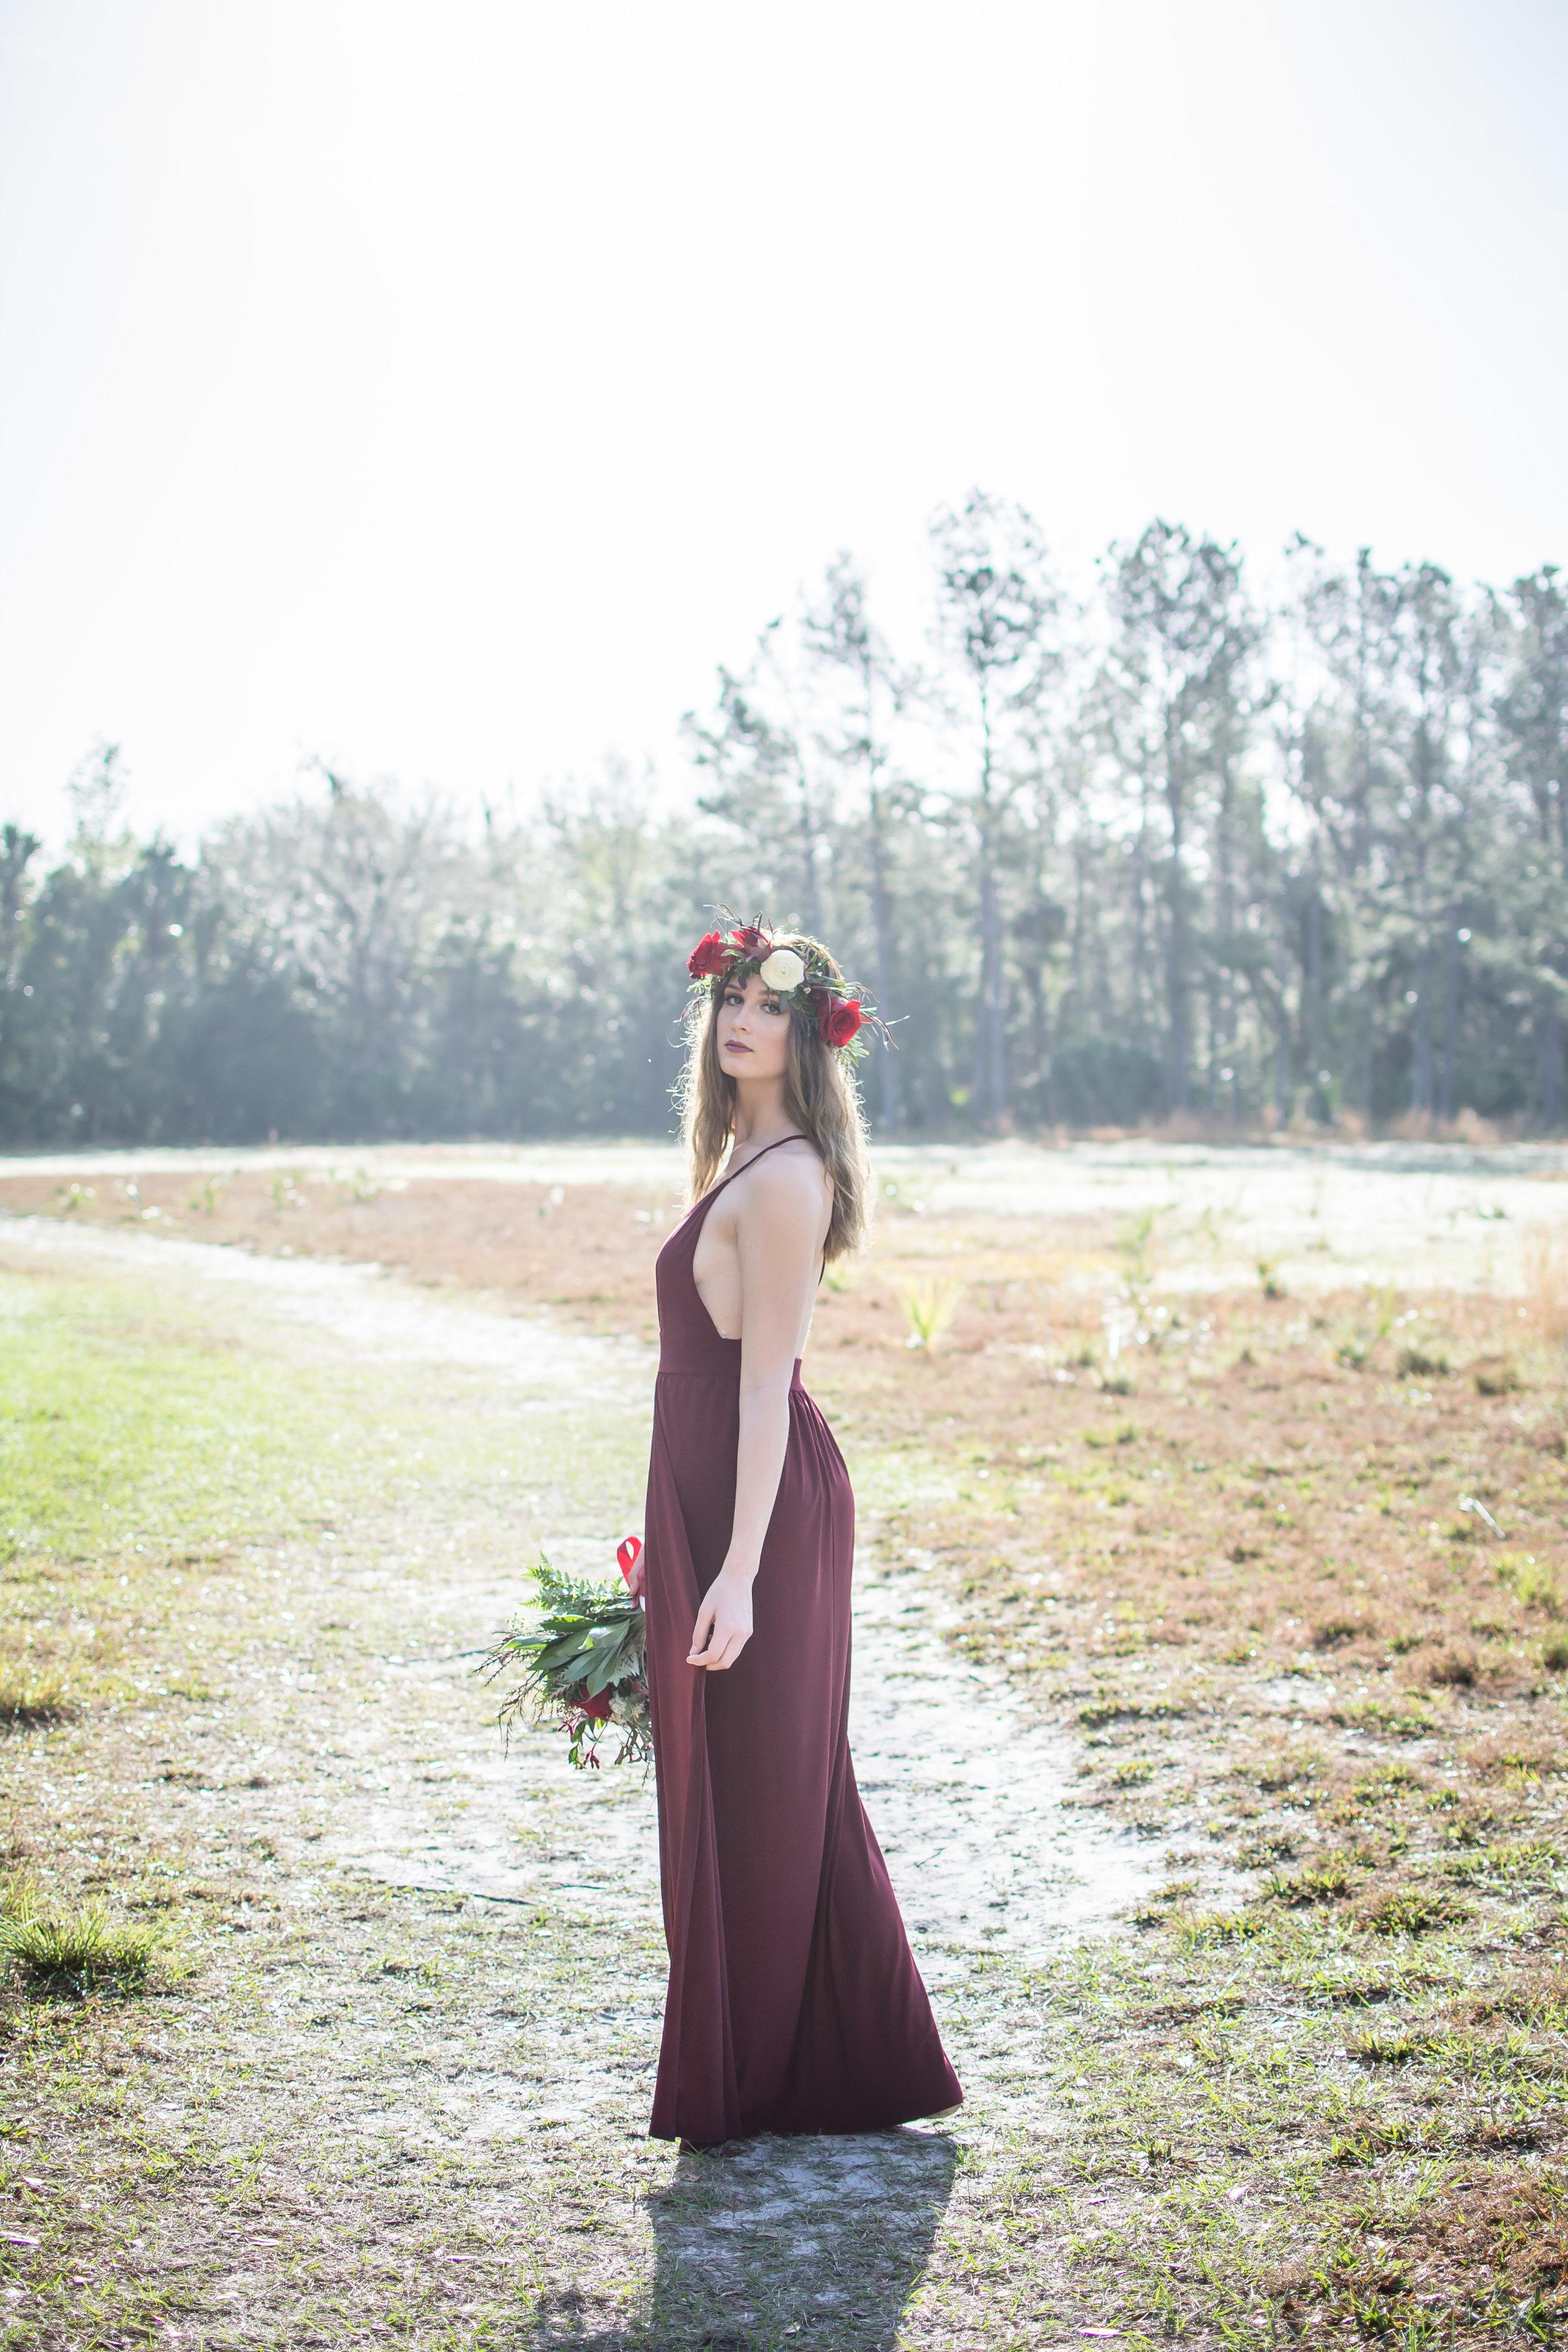 whimsical-bridal-inspiration-fashion-photoshoot-geneva-photographer-yanitza-ninett-35.jpg